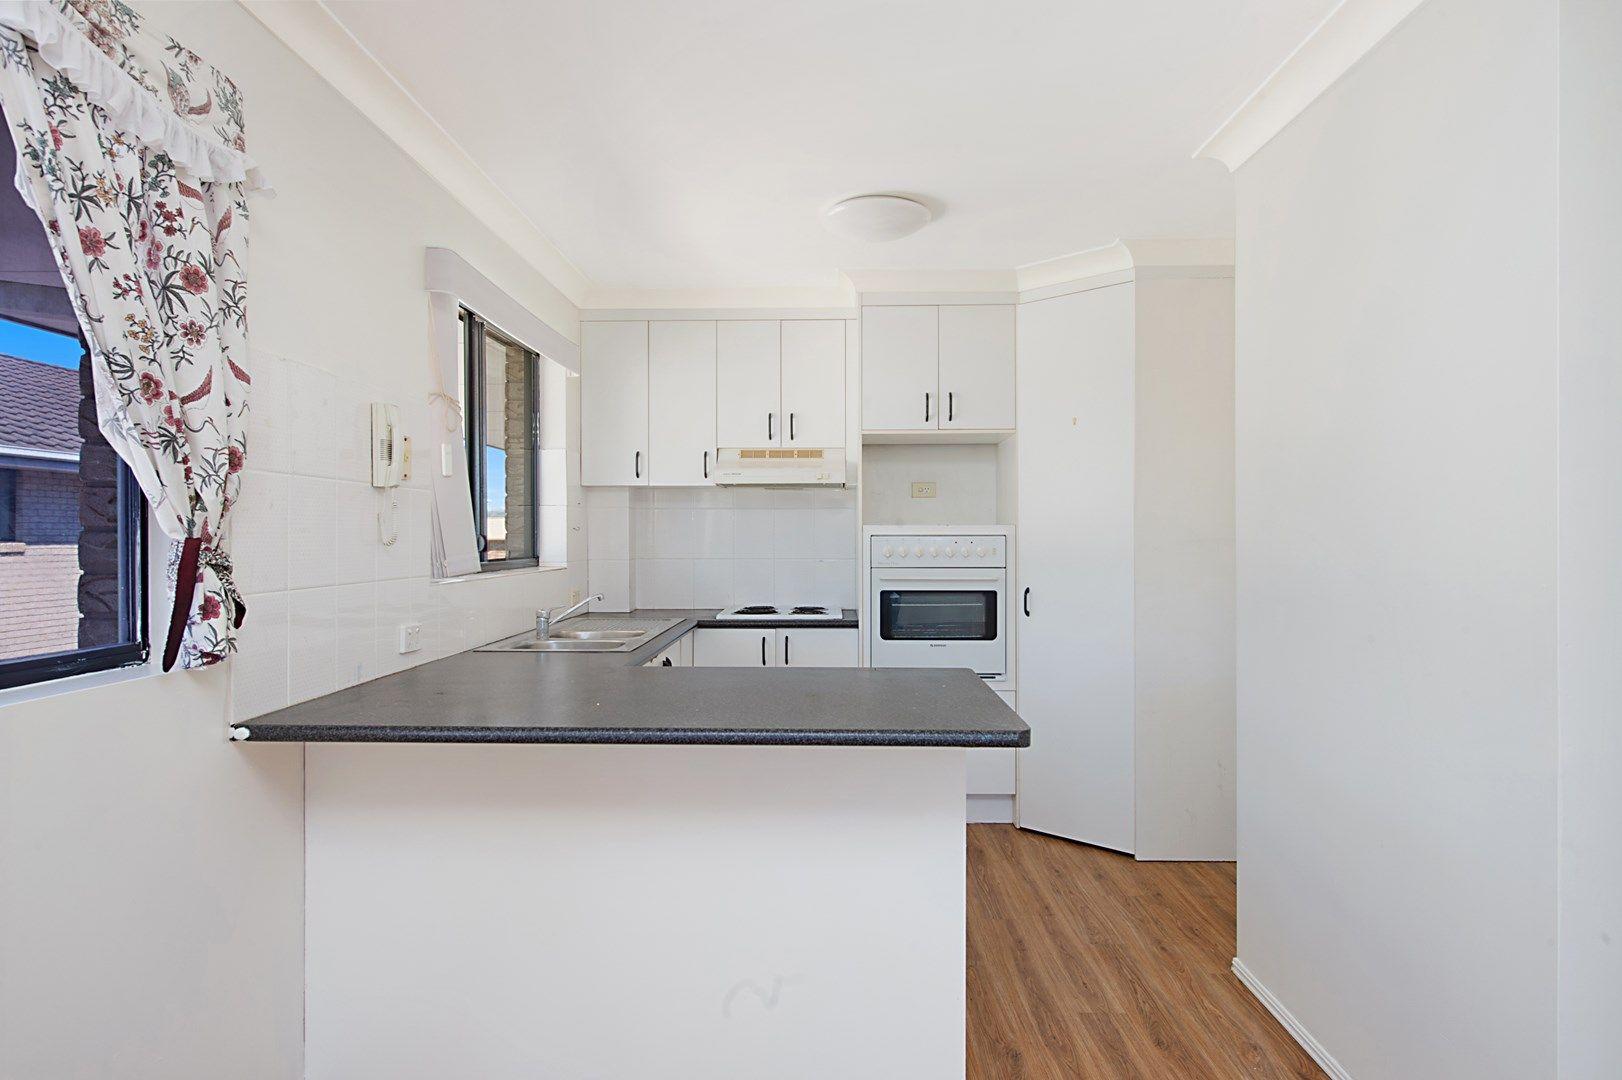 14/3-5 Barrett Street, Tweed Heads NSW 2485, Image 0